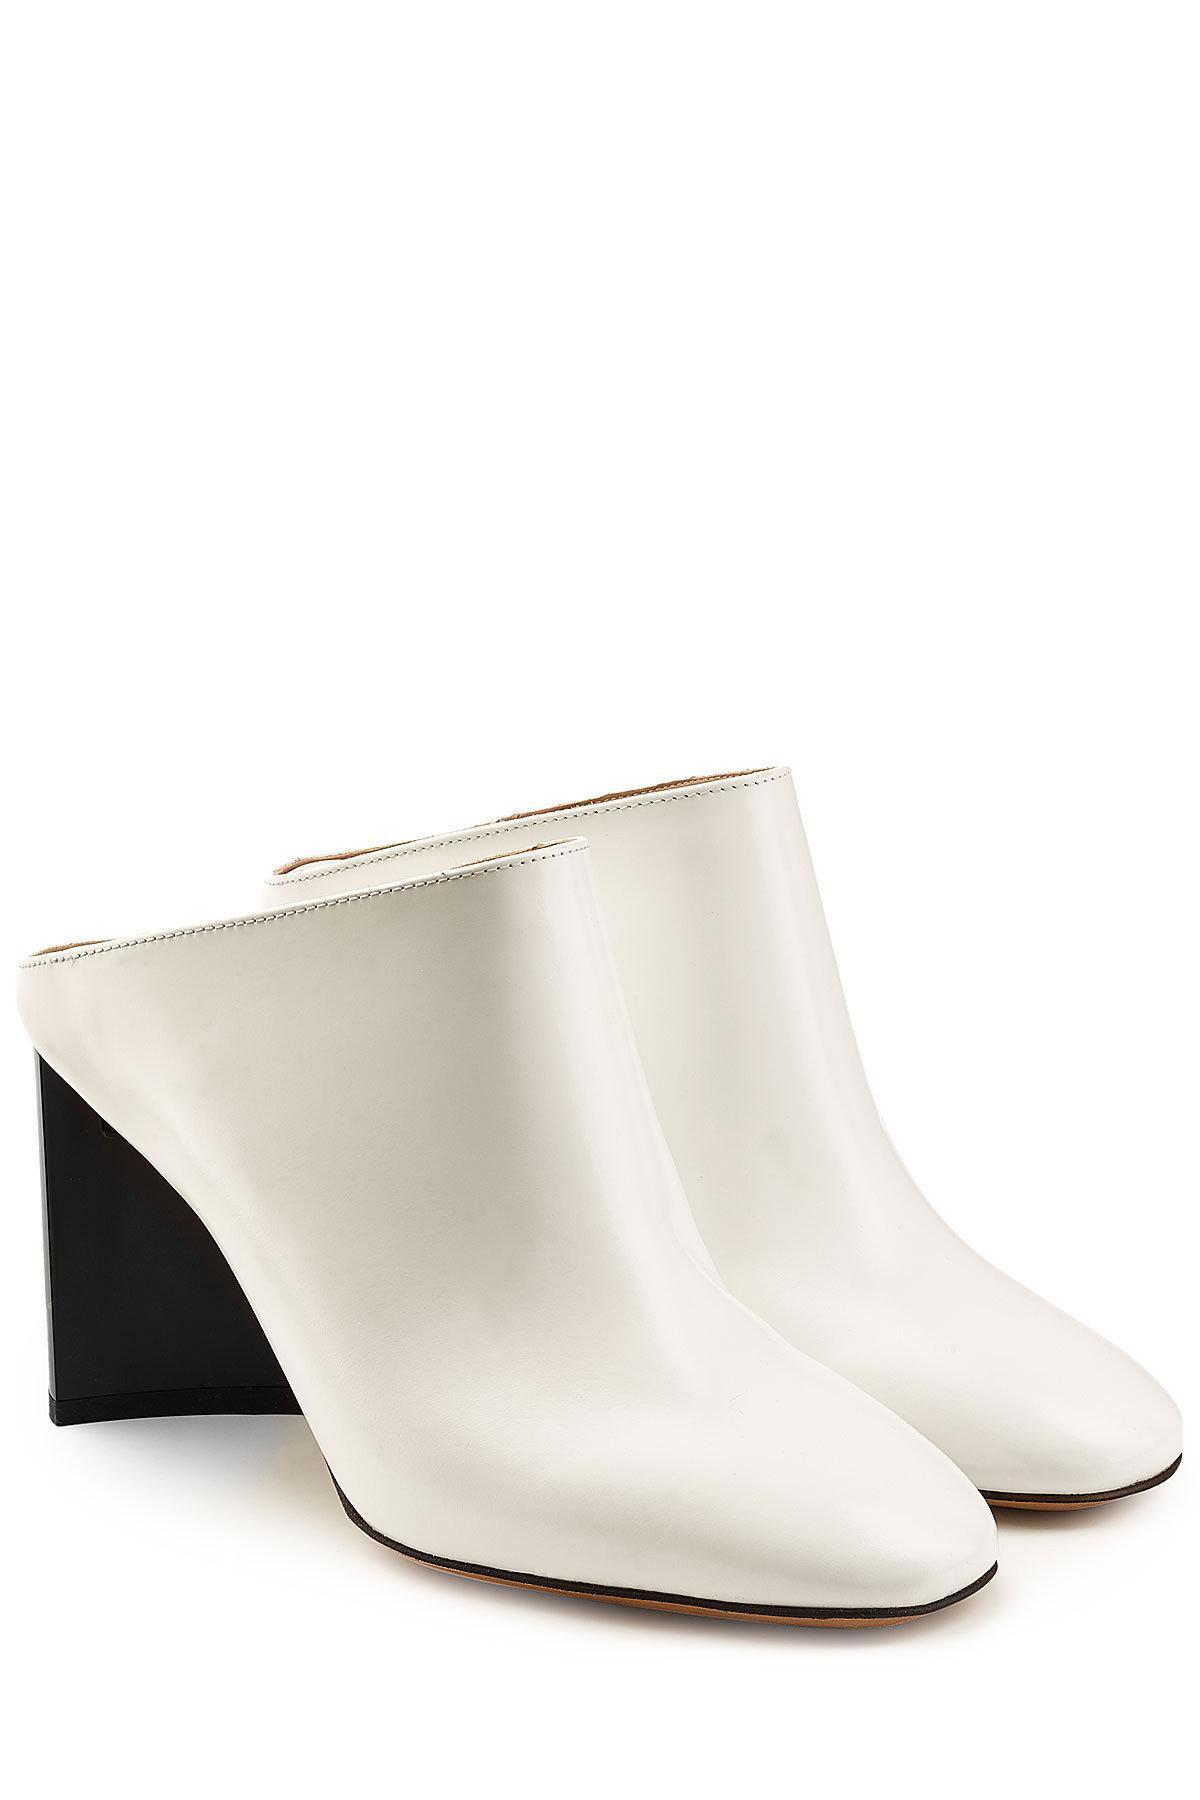 Womens Angled-Heel Leather Mules Maison Martin Margiela 35TAOMeHA5